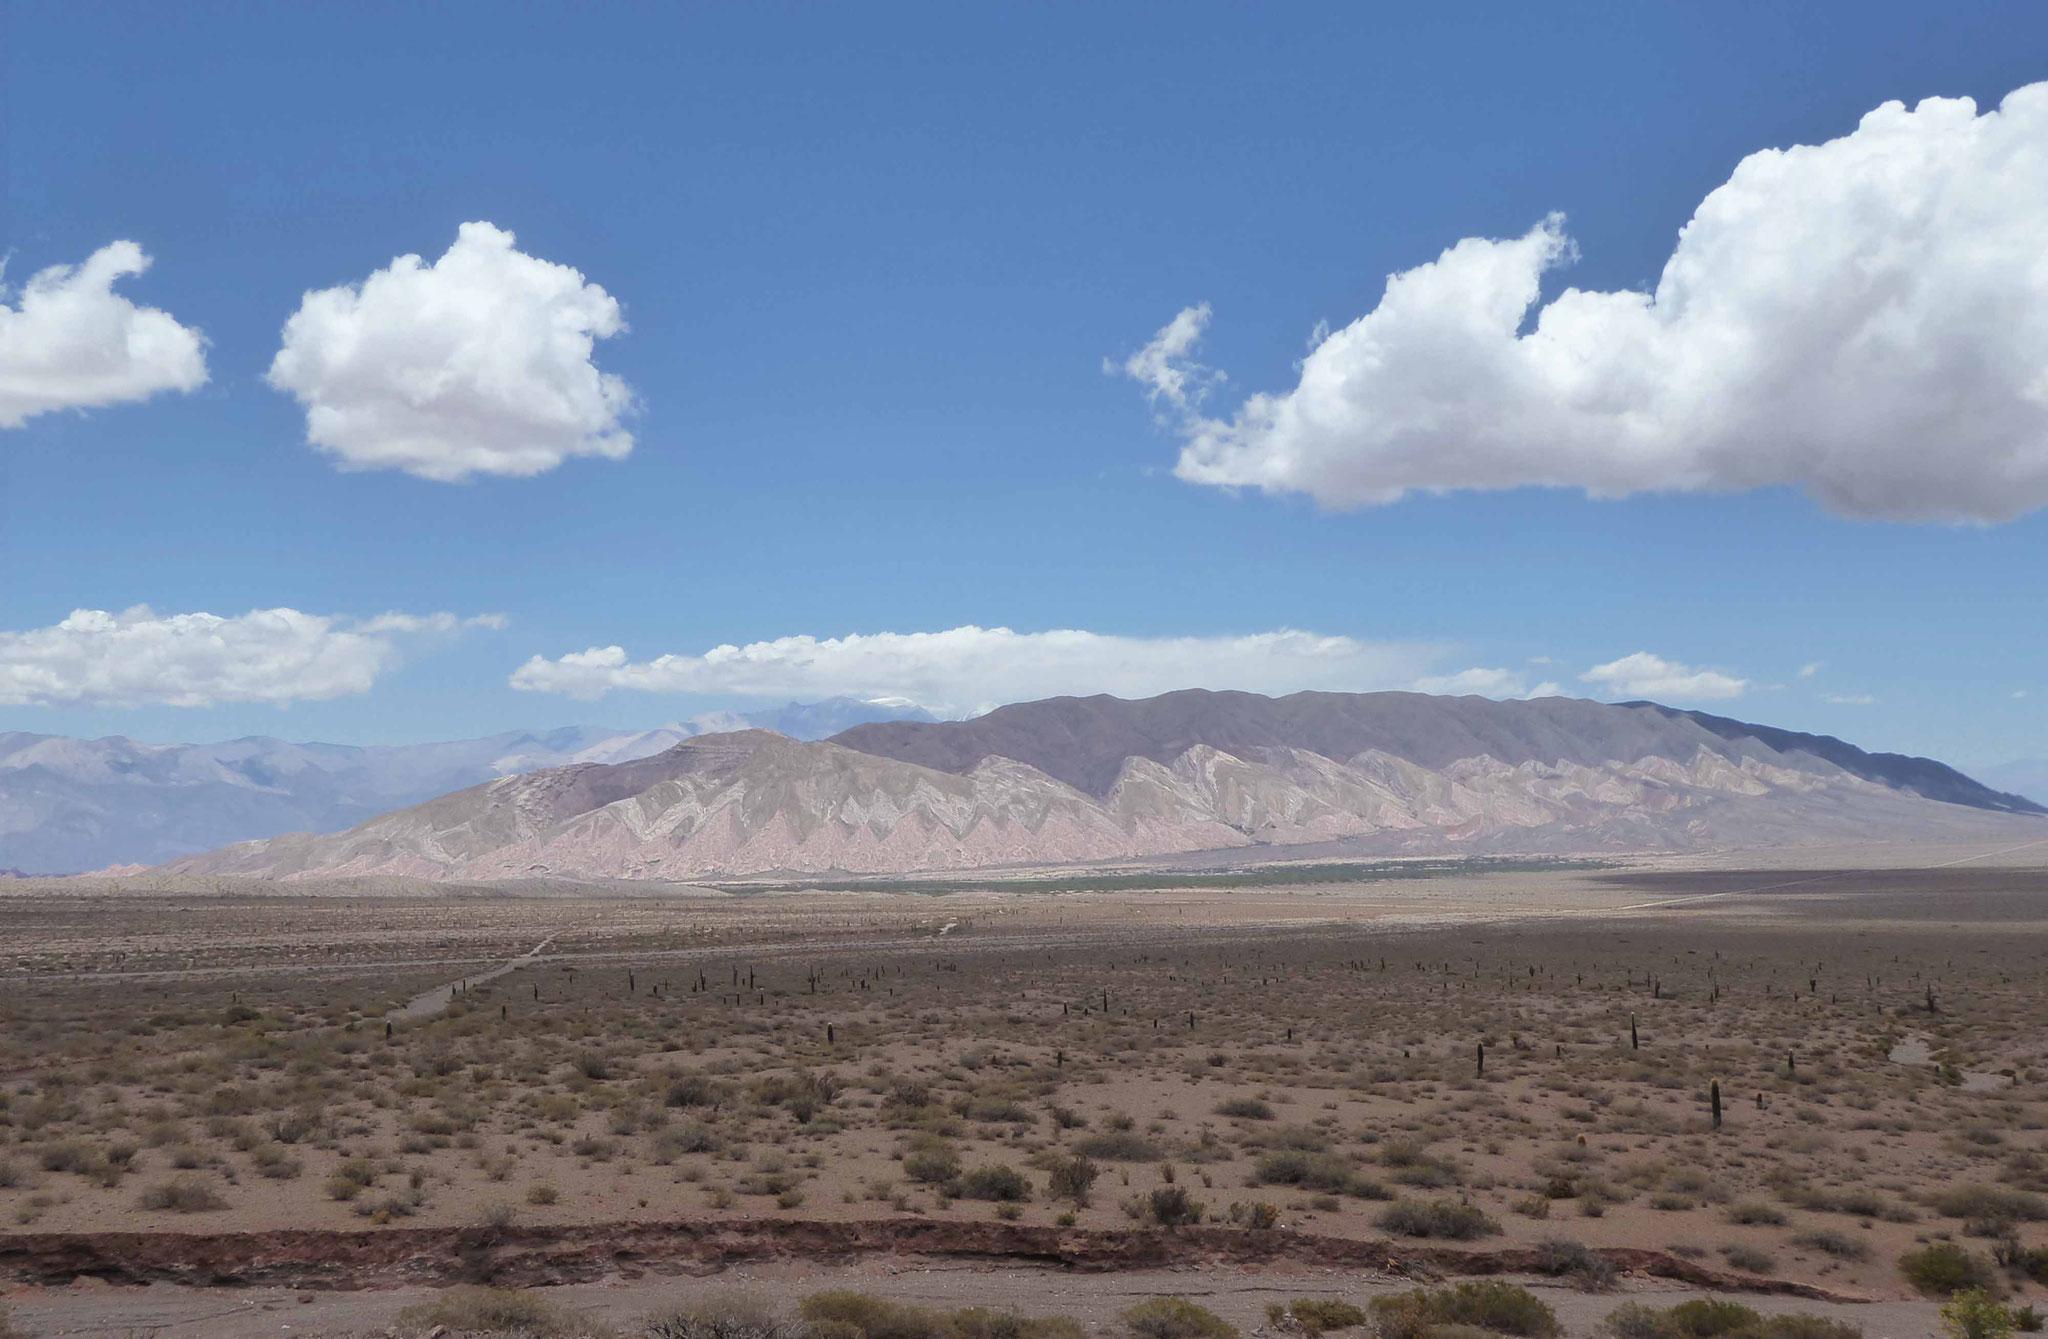 El Cerro Tin Tin sur le chemin de l'Inca dans le Parc de los Cardones